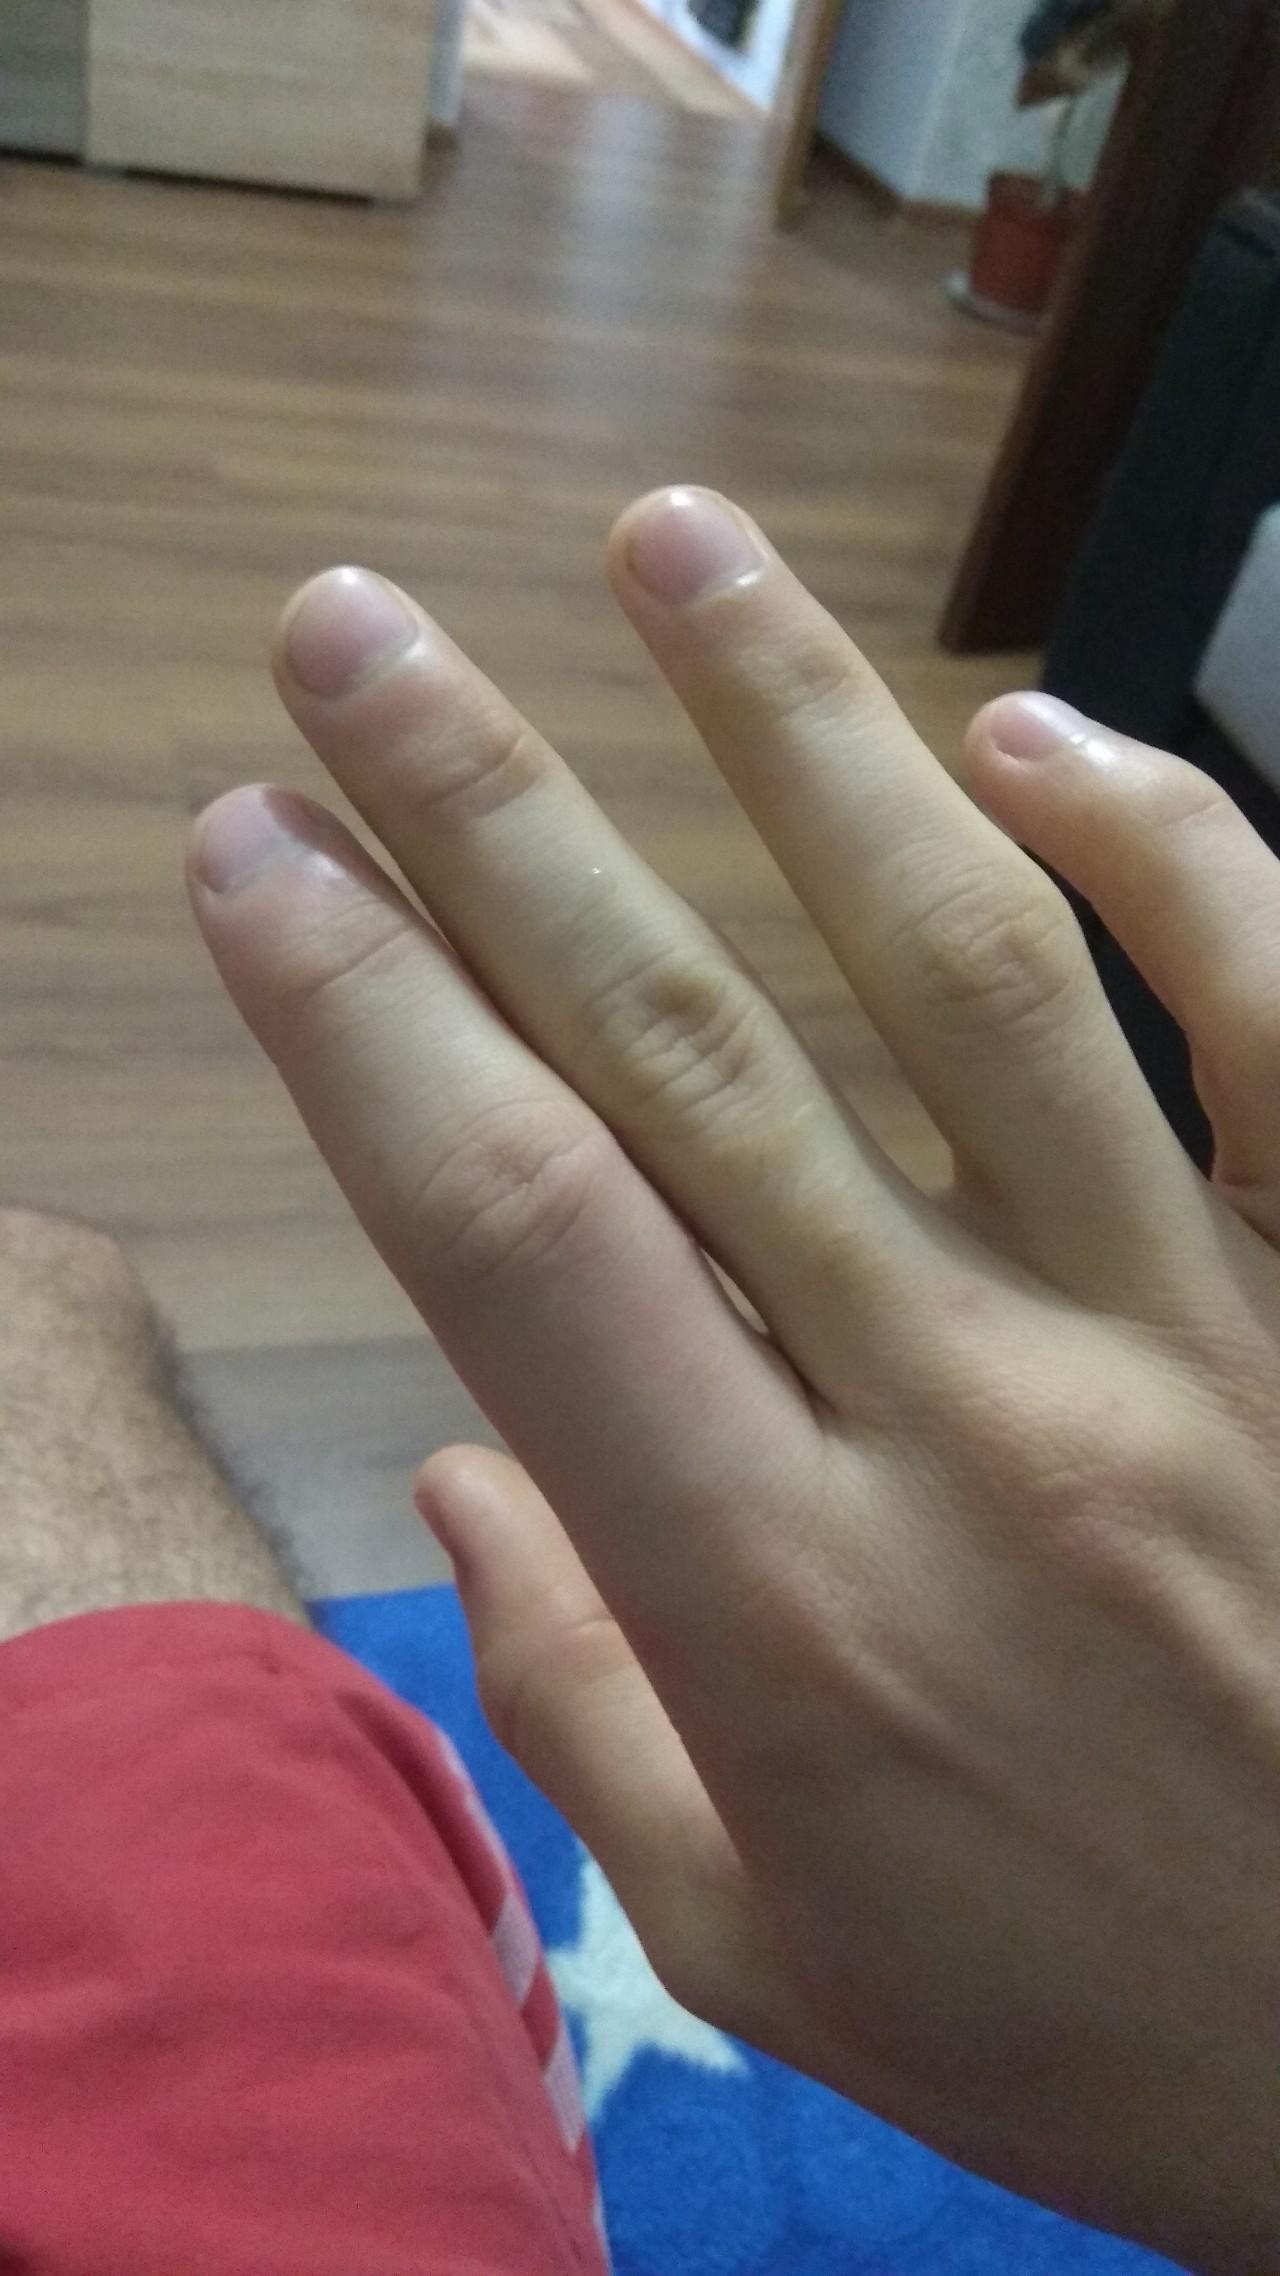 картинка опухший палец ощутила, когда